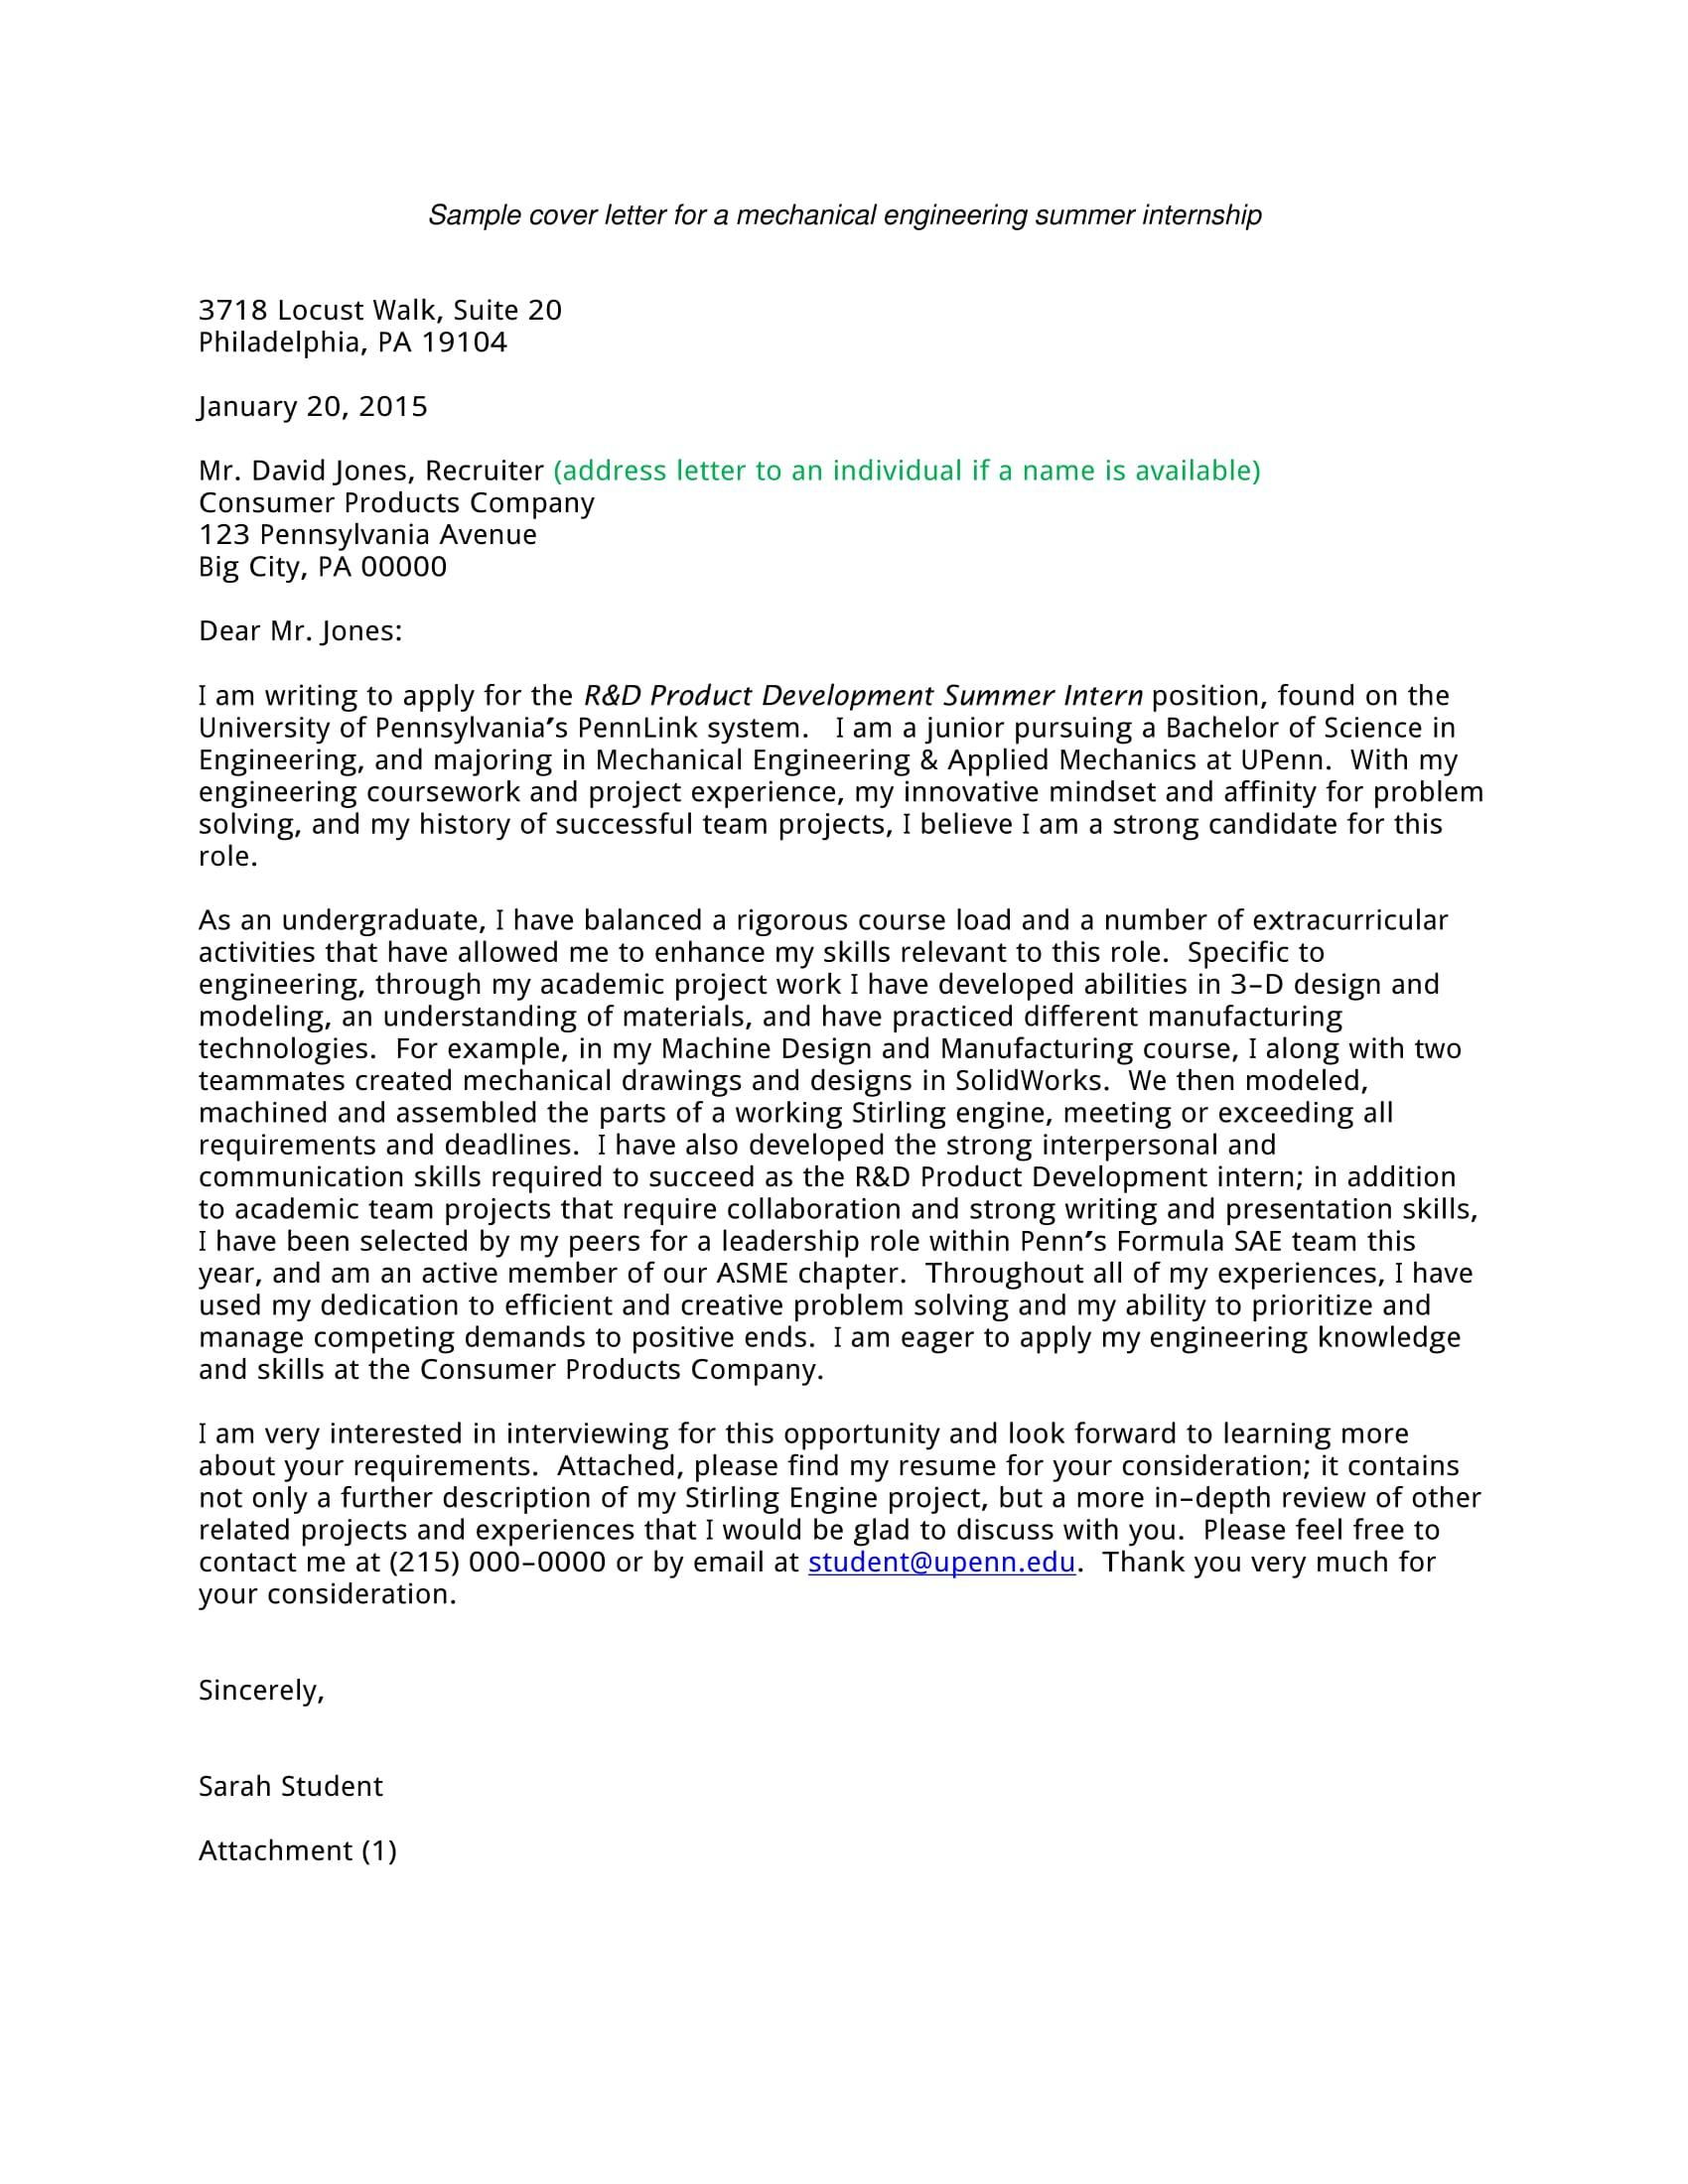 Internship cover letters solarfm internship cover letter expocarfo Gallery